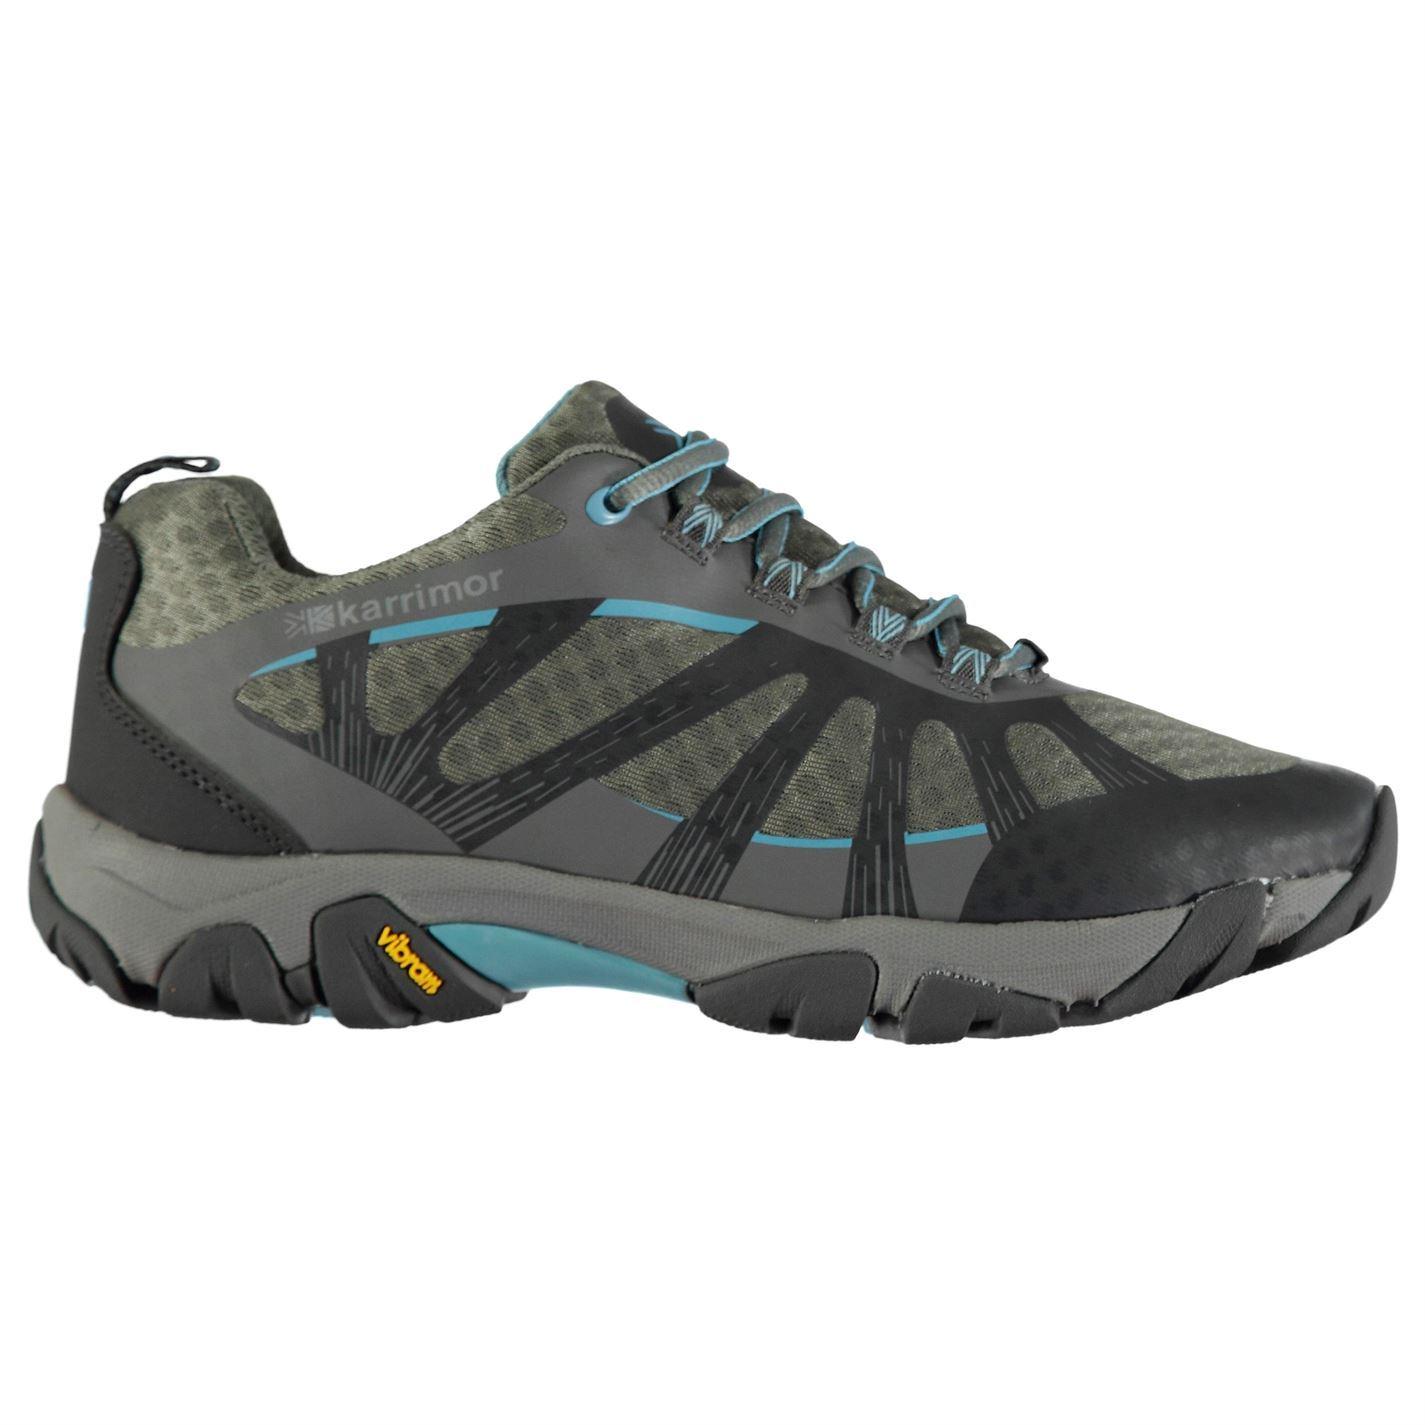 Sports Direct Uk Waterproof Shoes